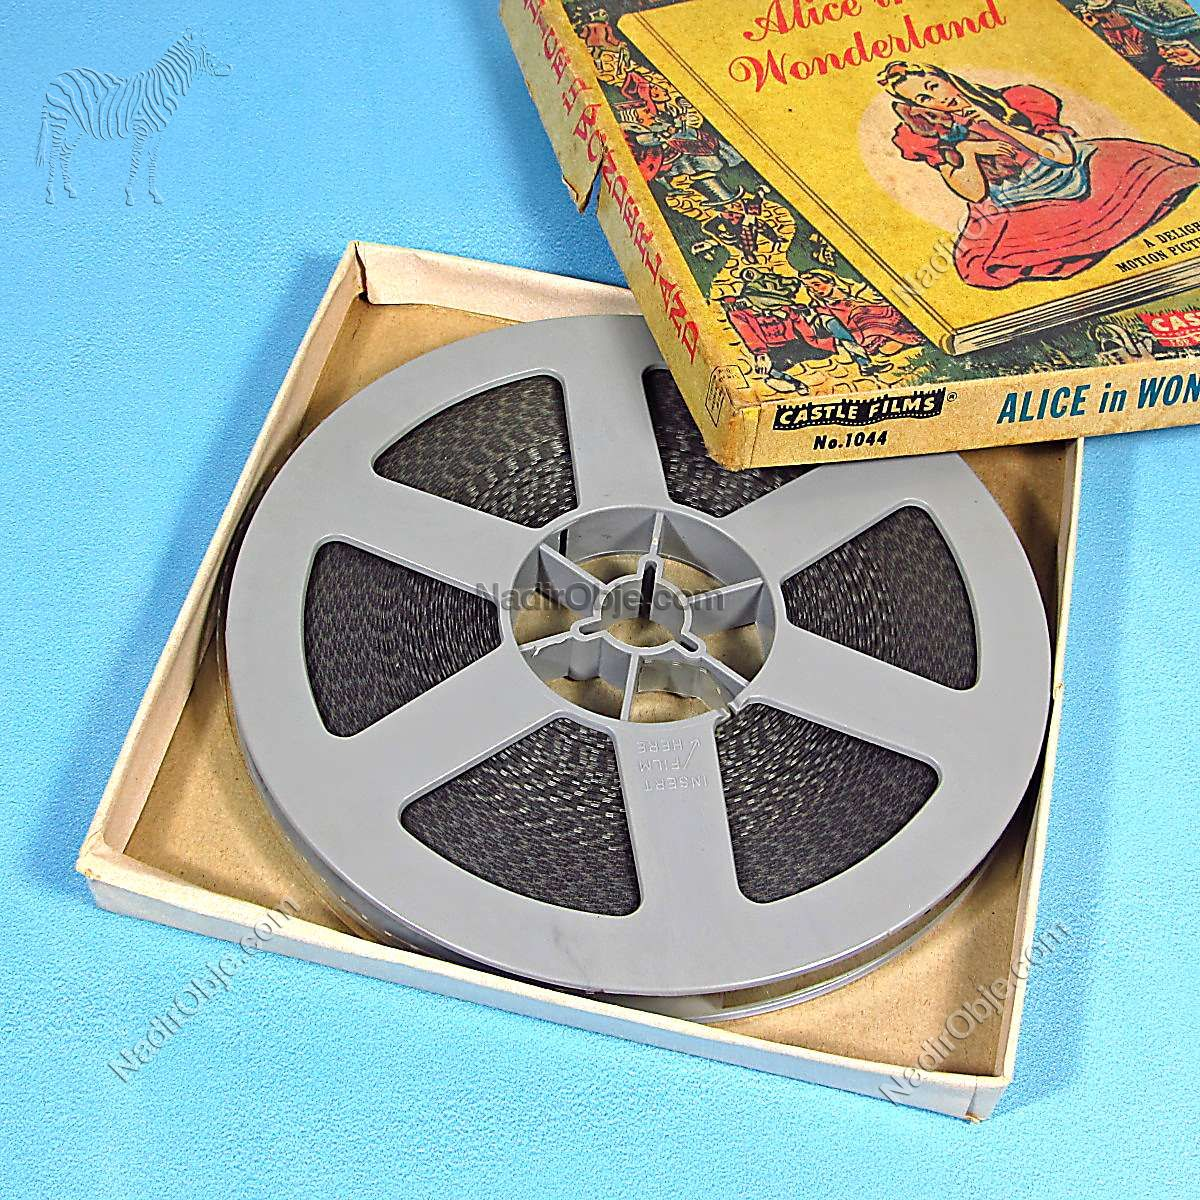 Alice in Wonderland 8 mm Film Diğer Objeler 8 mm